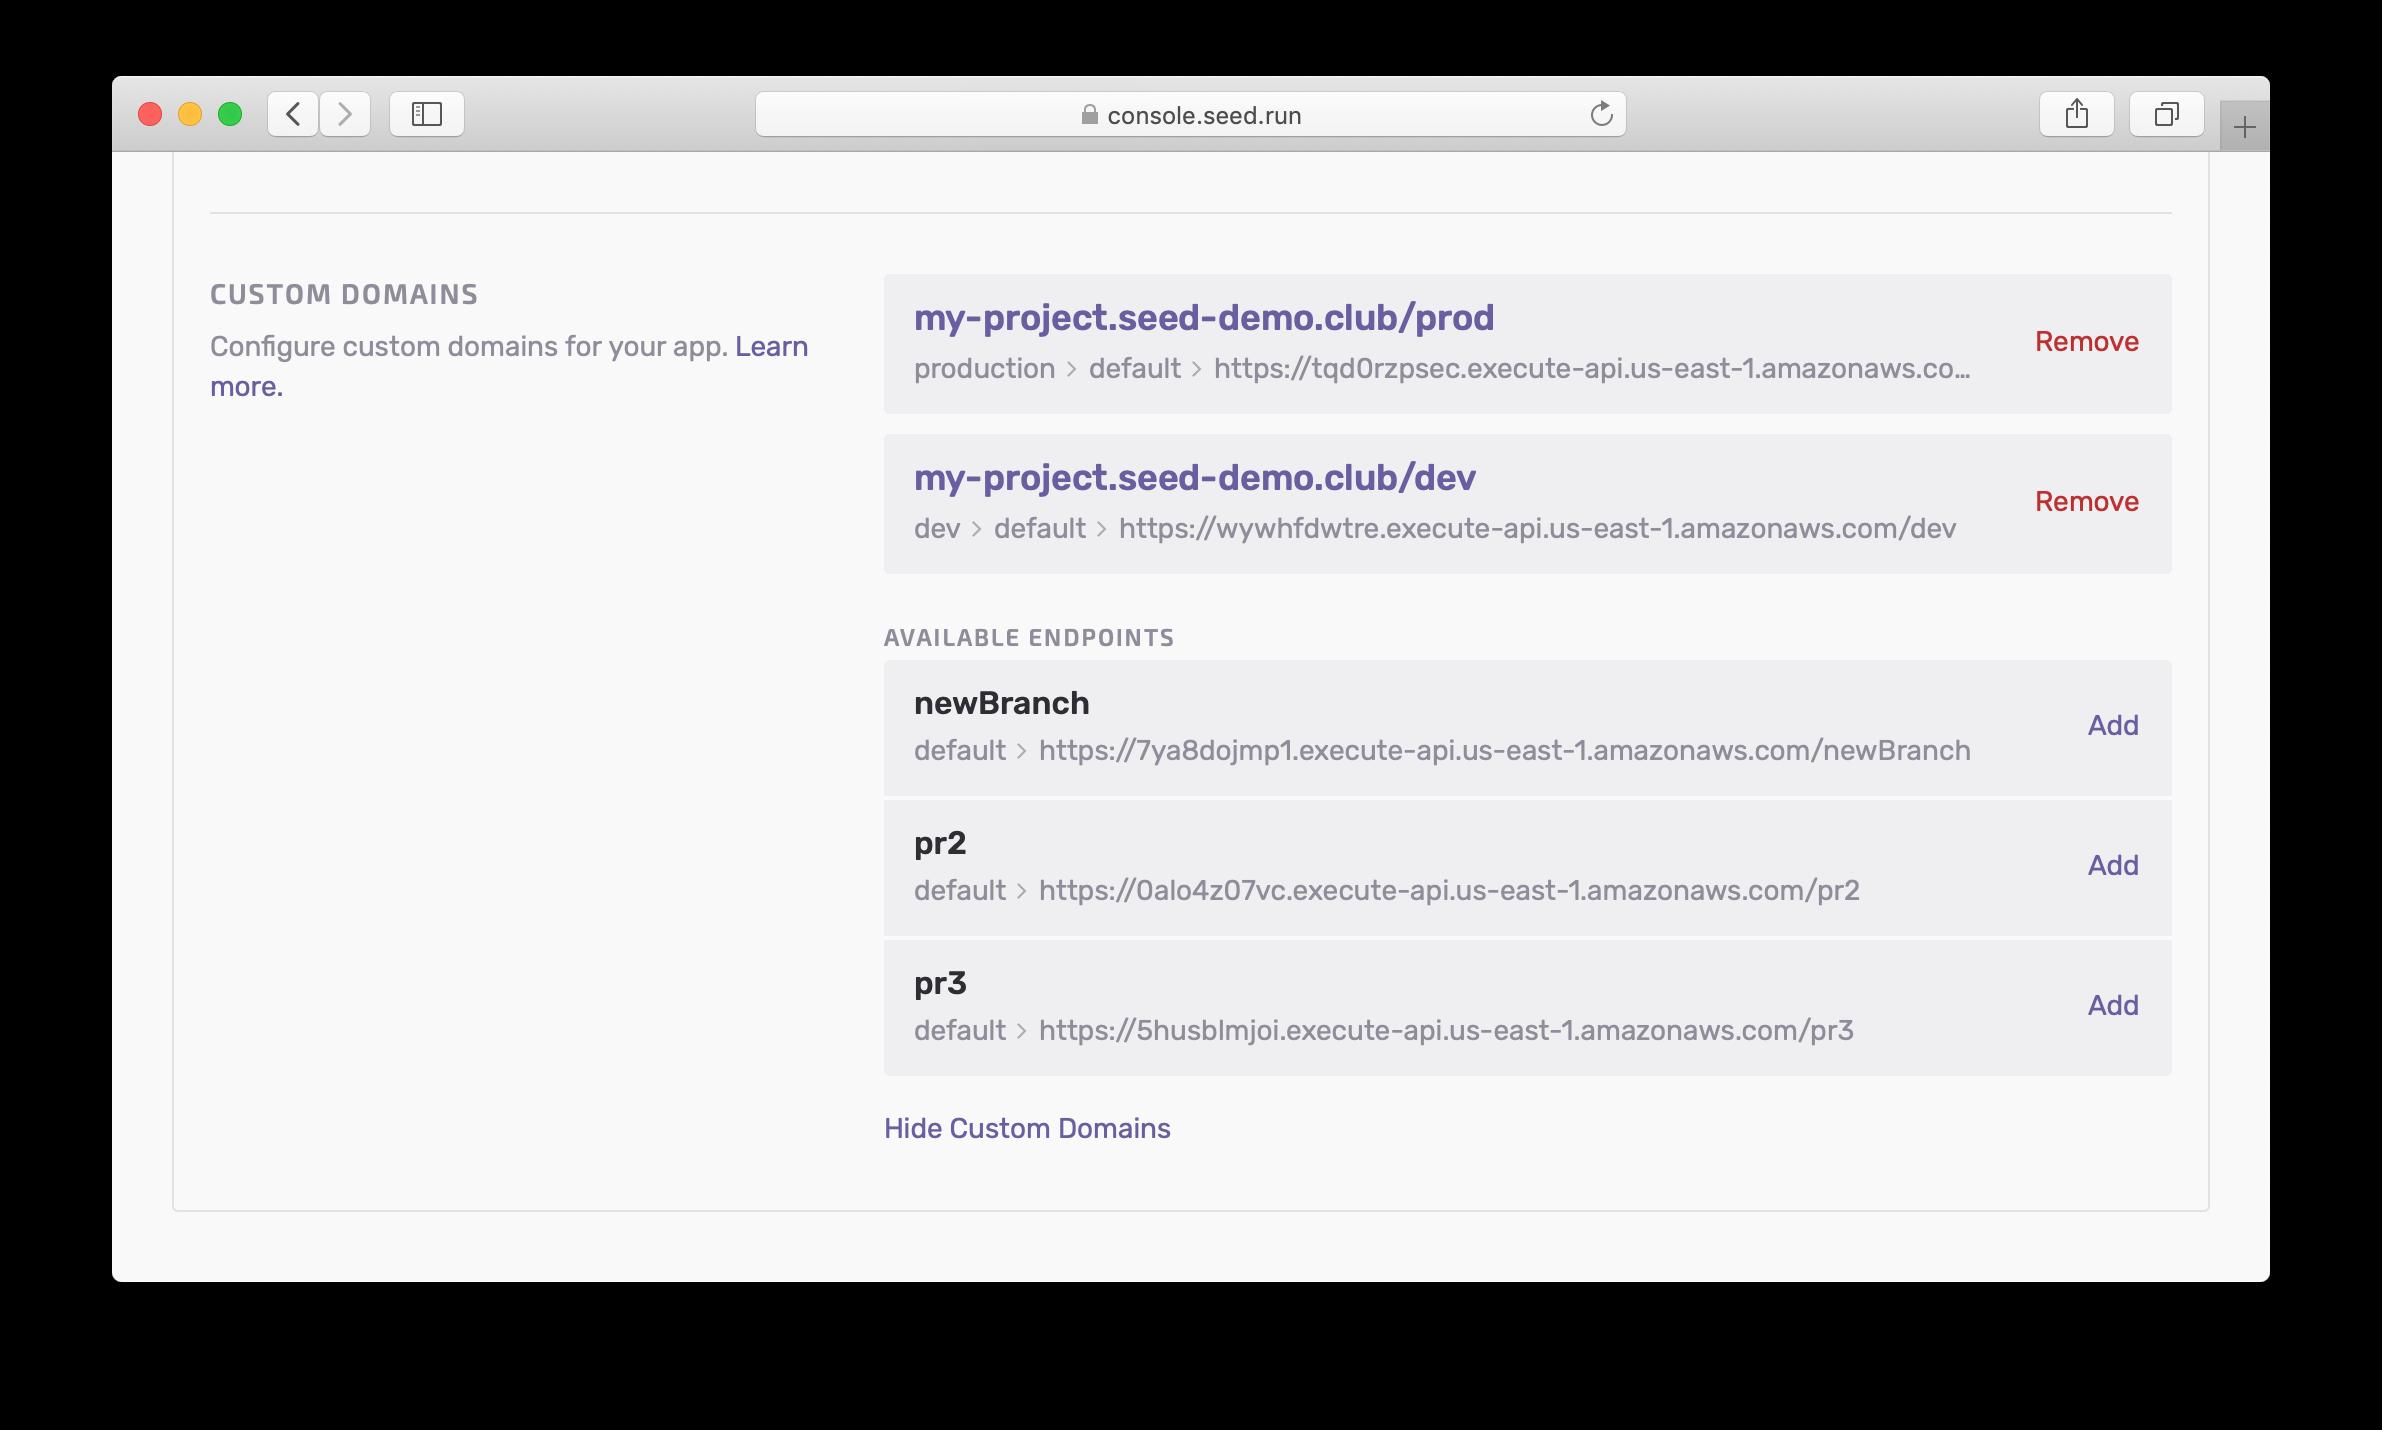 Managing Serverless Custom Domain in Seed